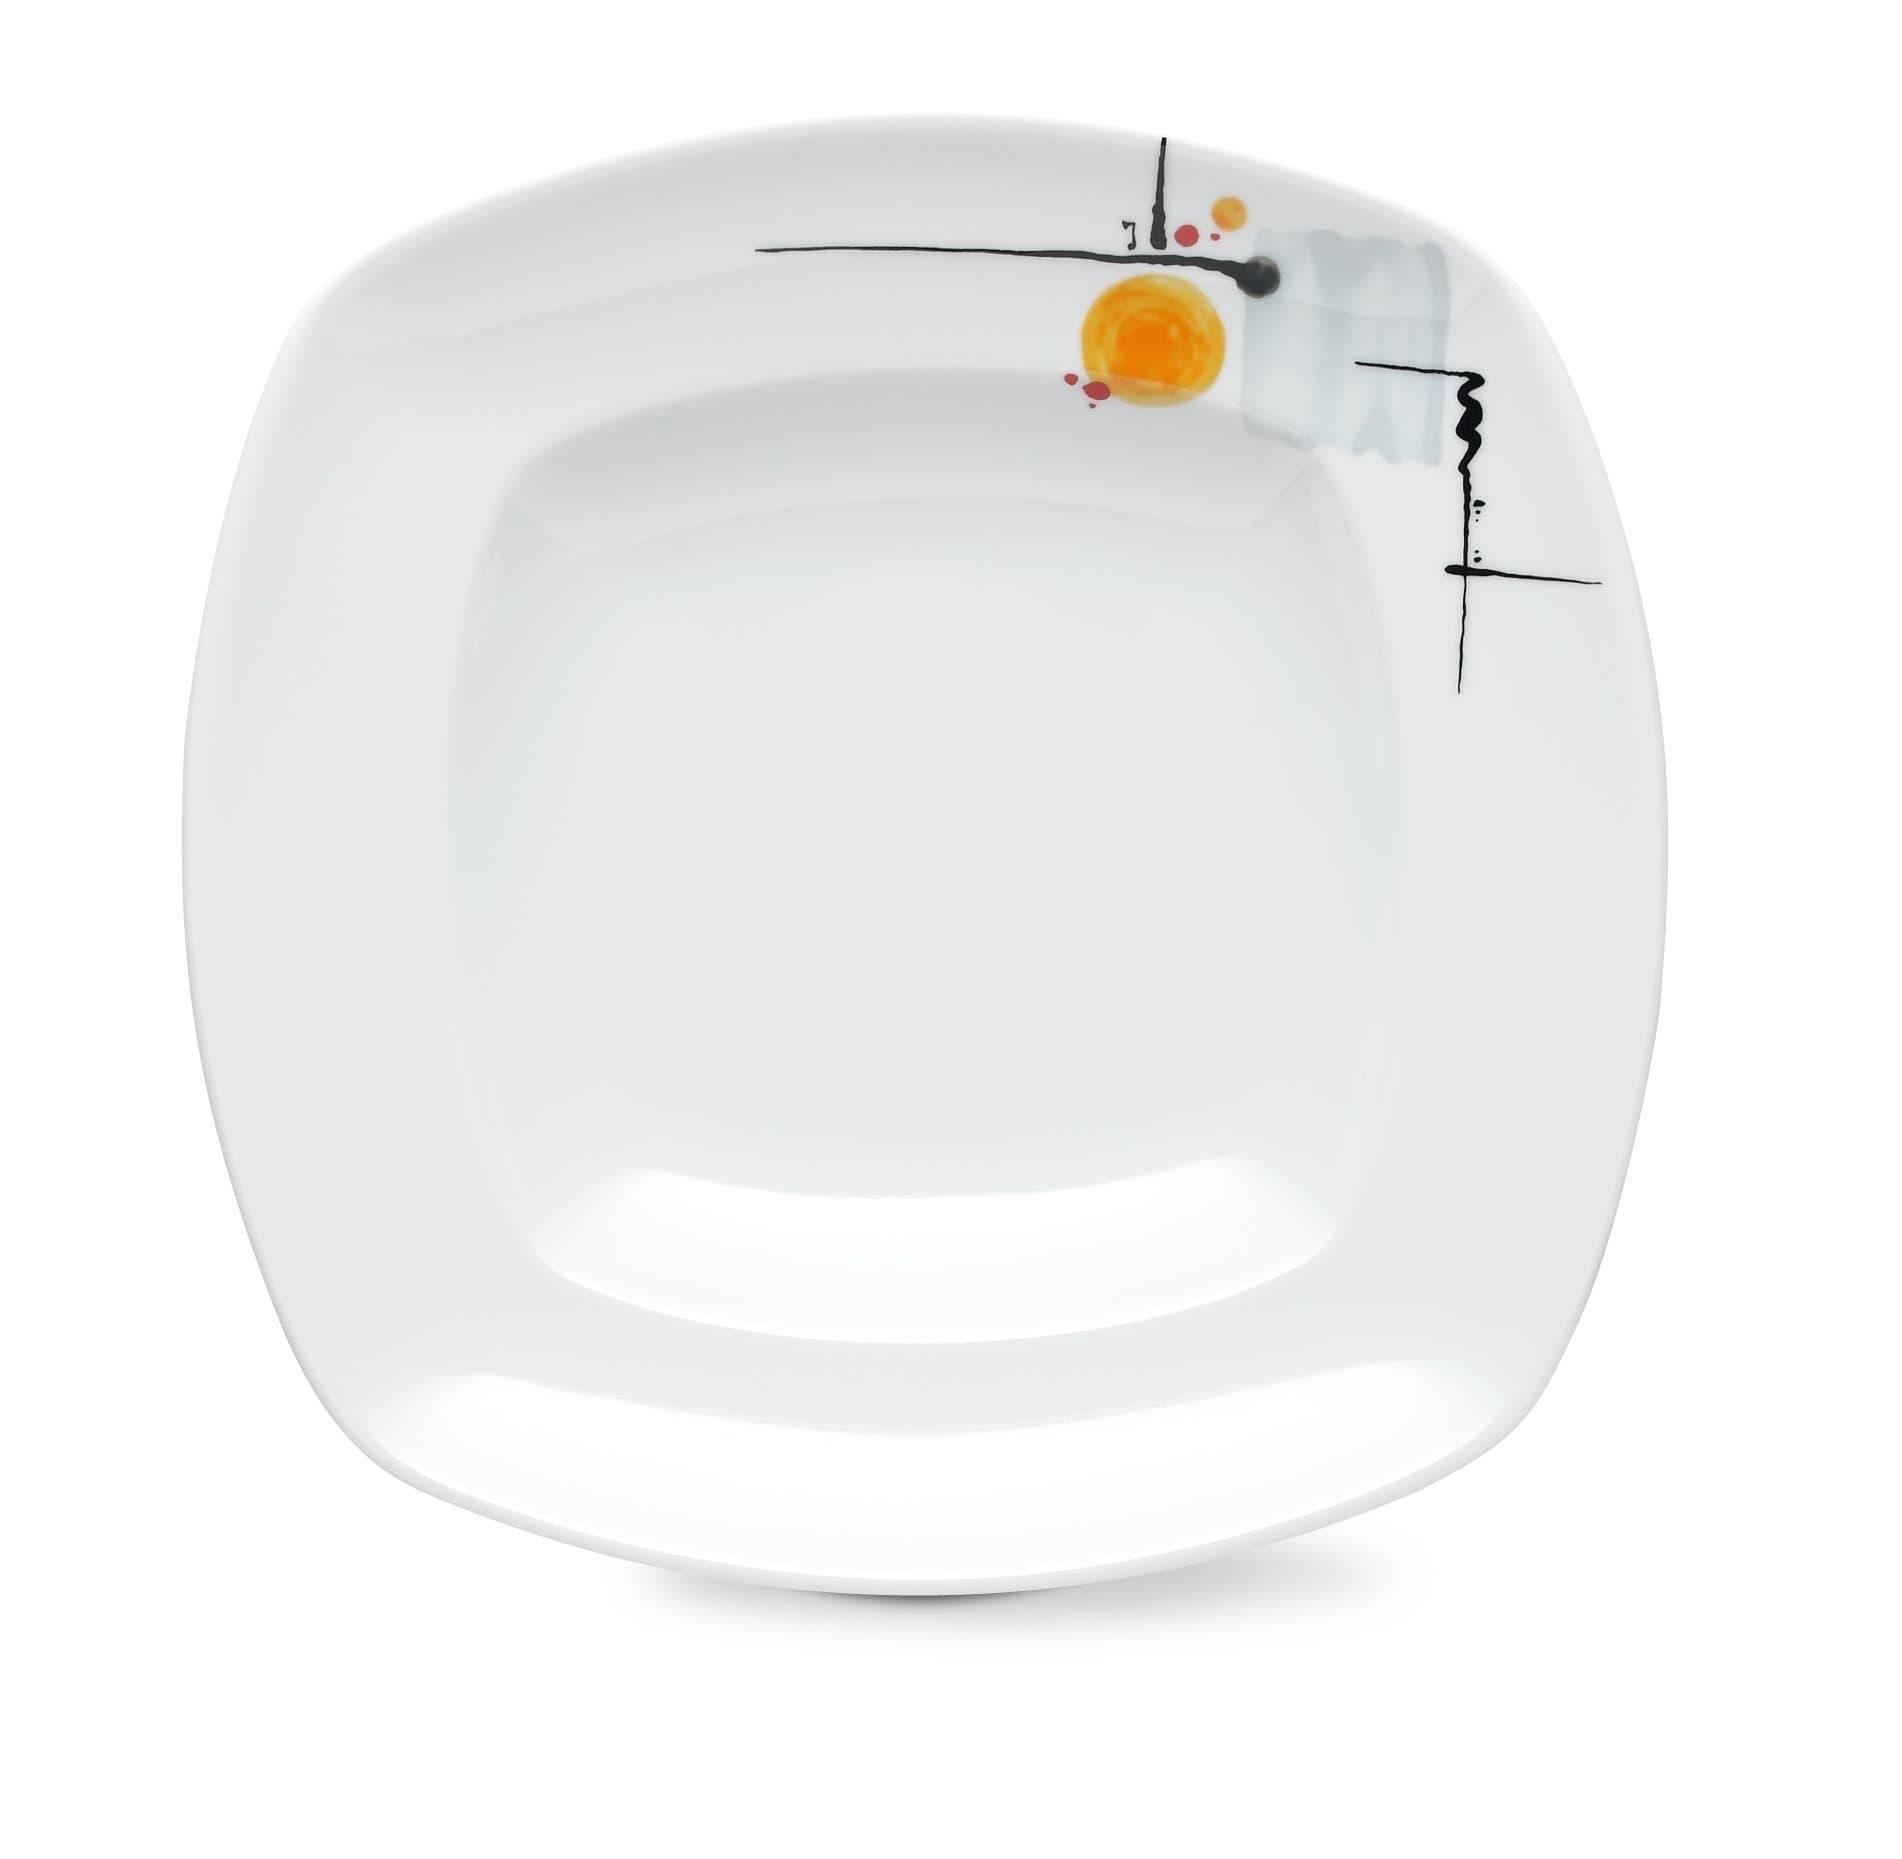 Cucina & Tavola SUNRISE Piatto per pasta